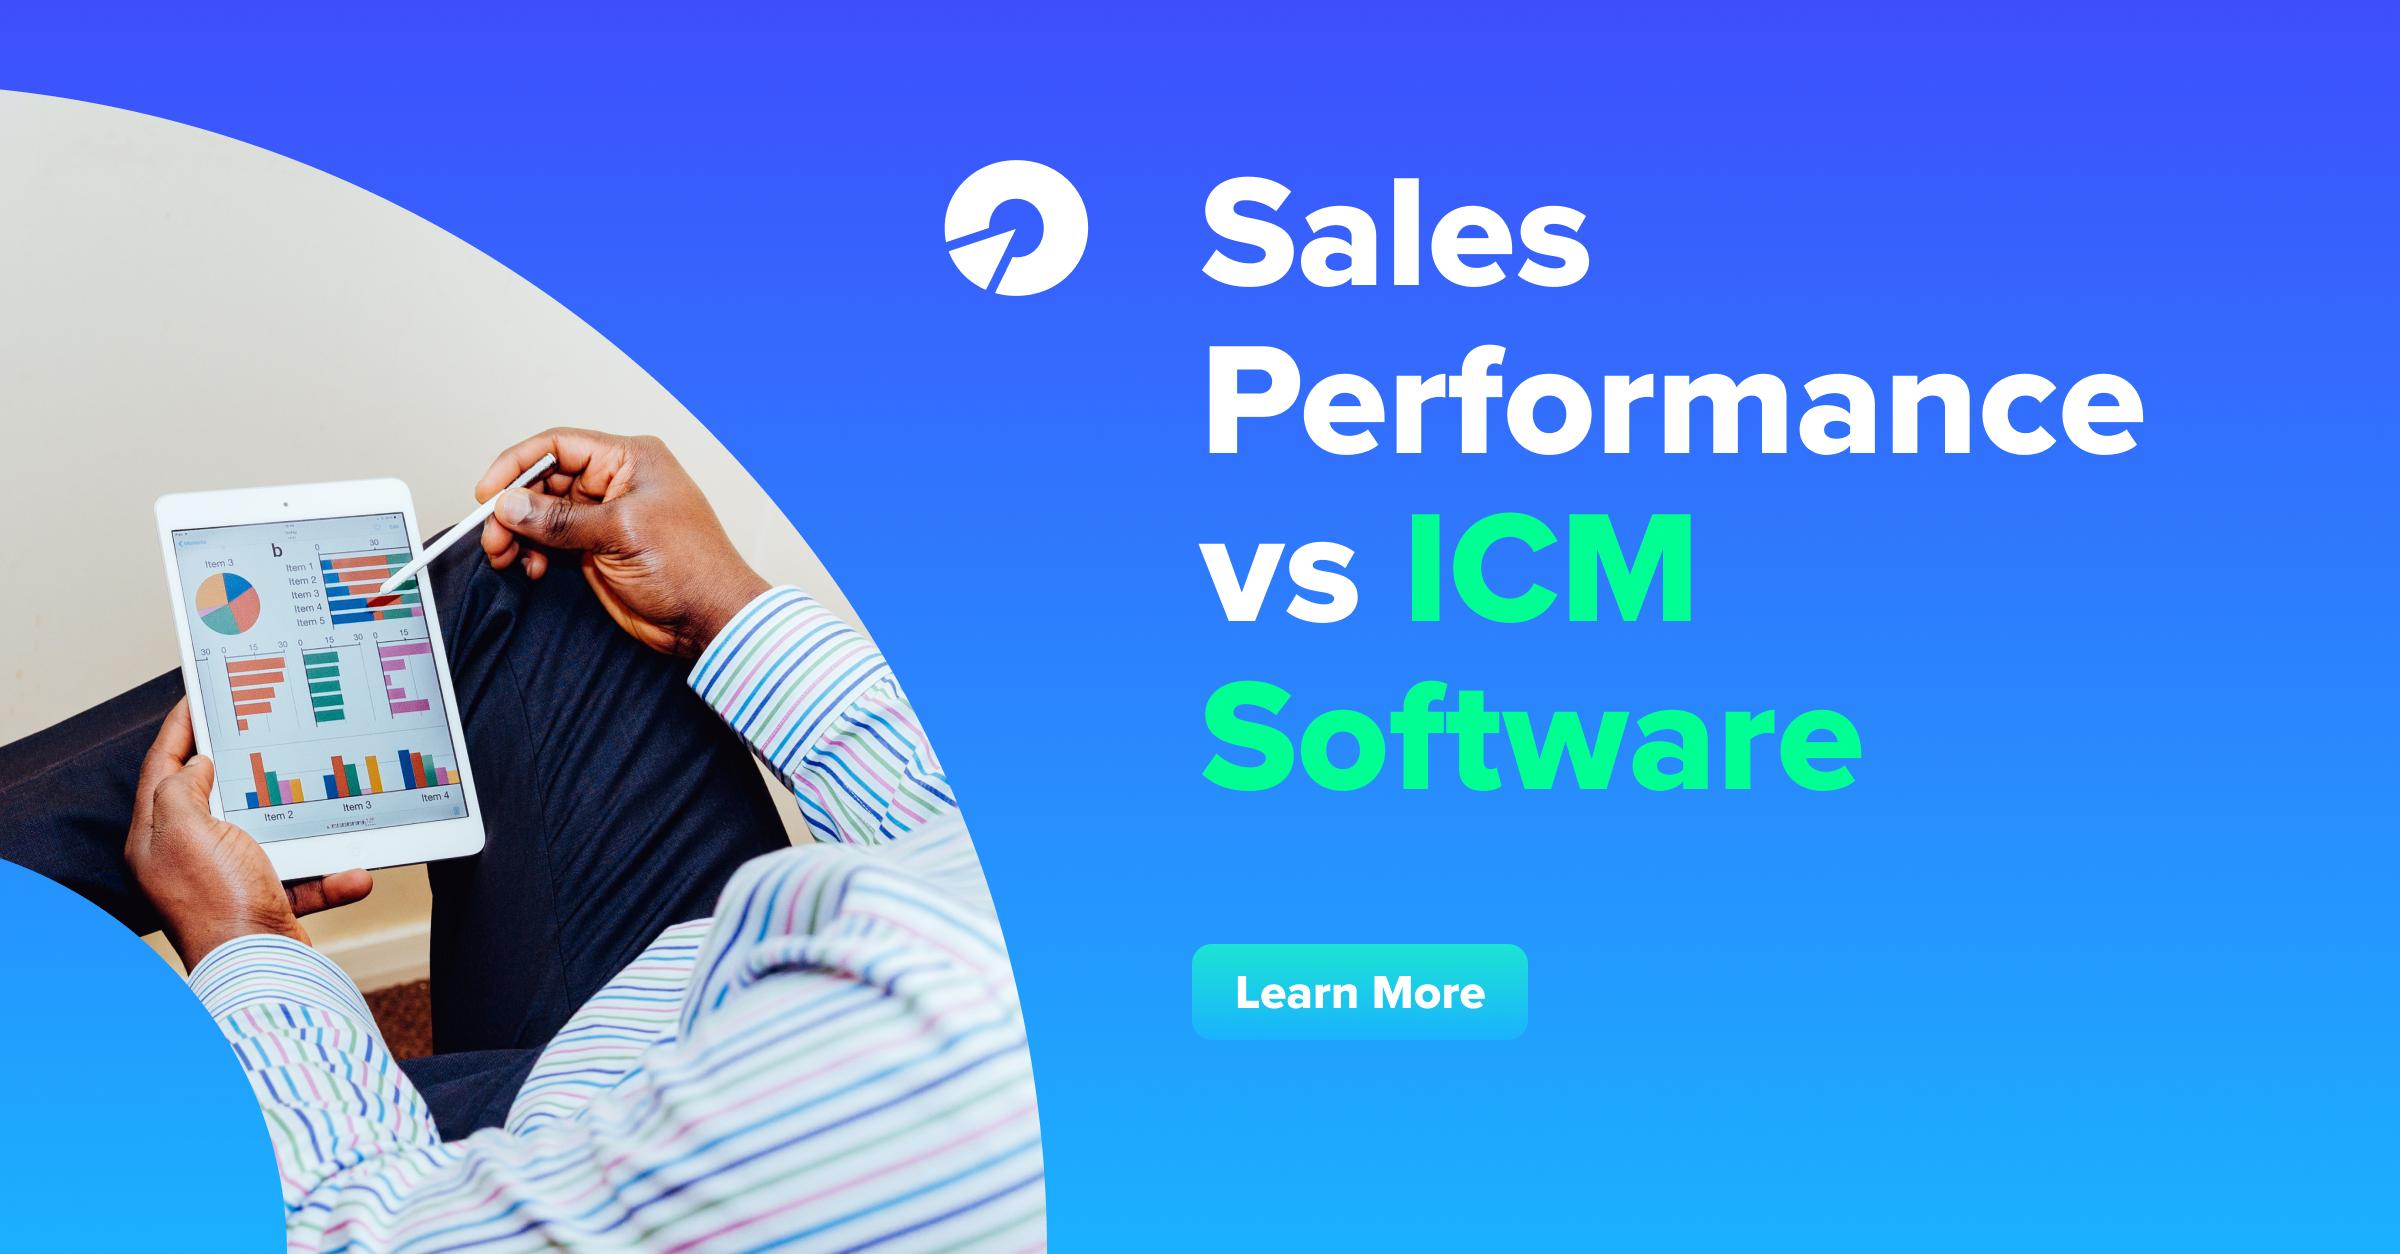 SPM Software vs ICM Software